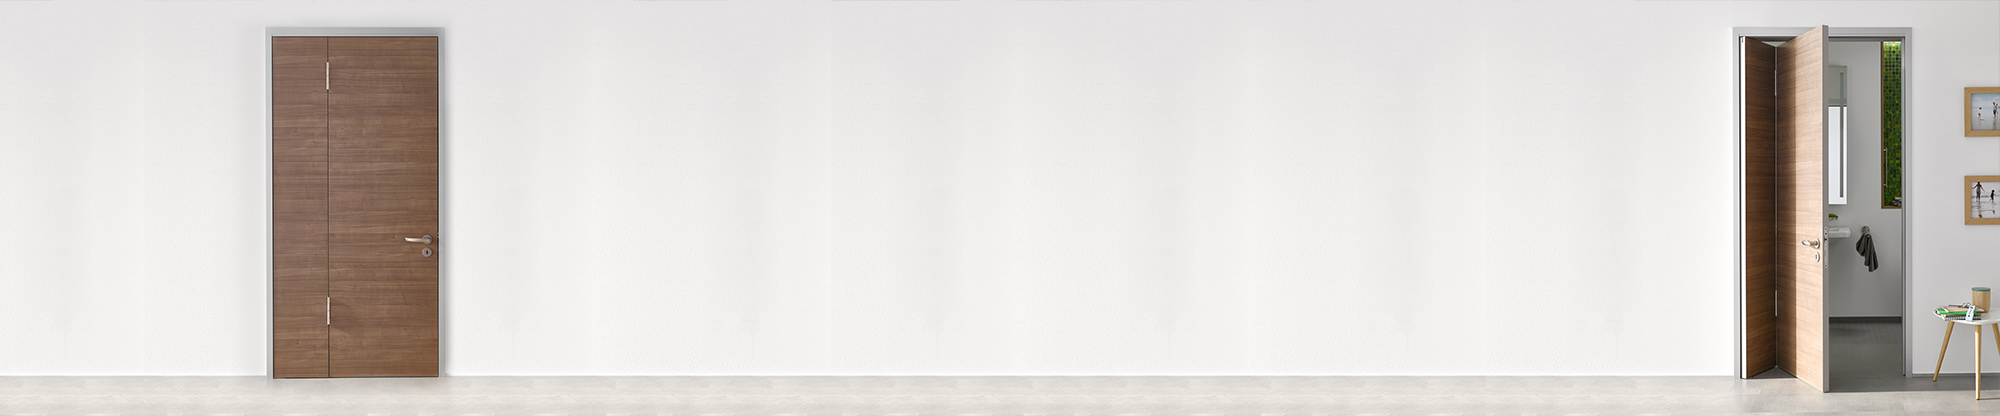 Türblatt vertikal geteilt mit Raumsparfunktion